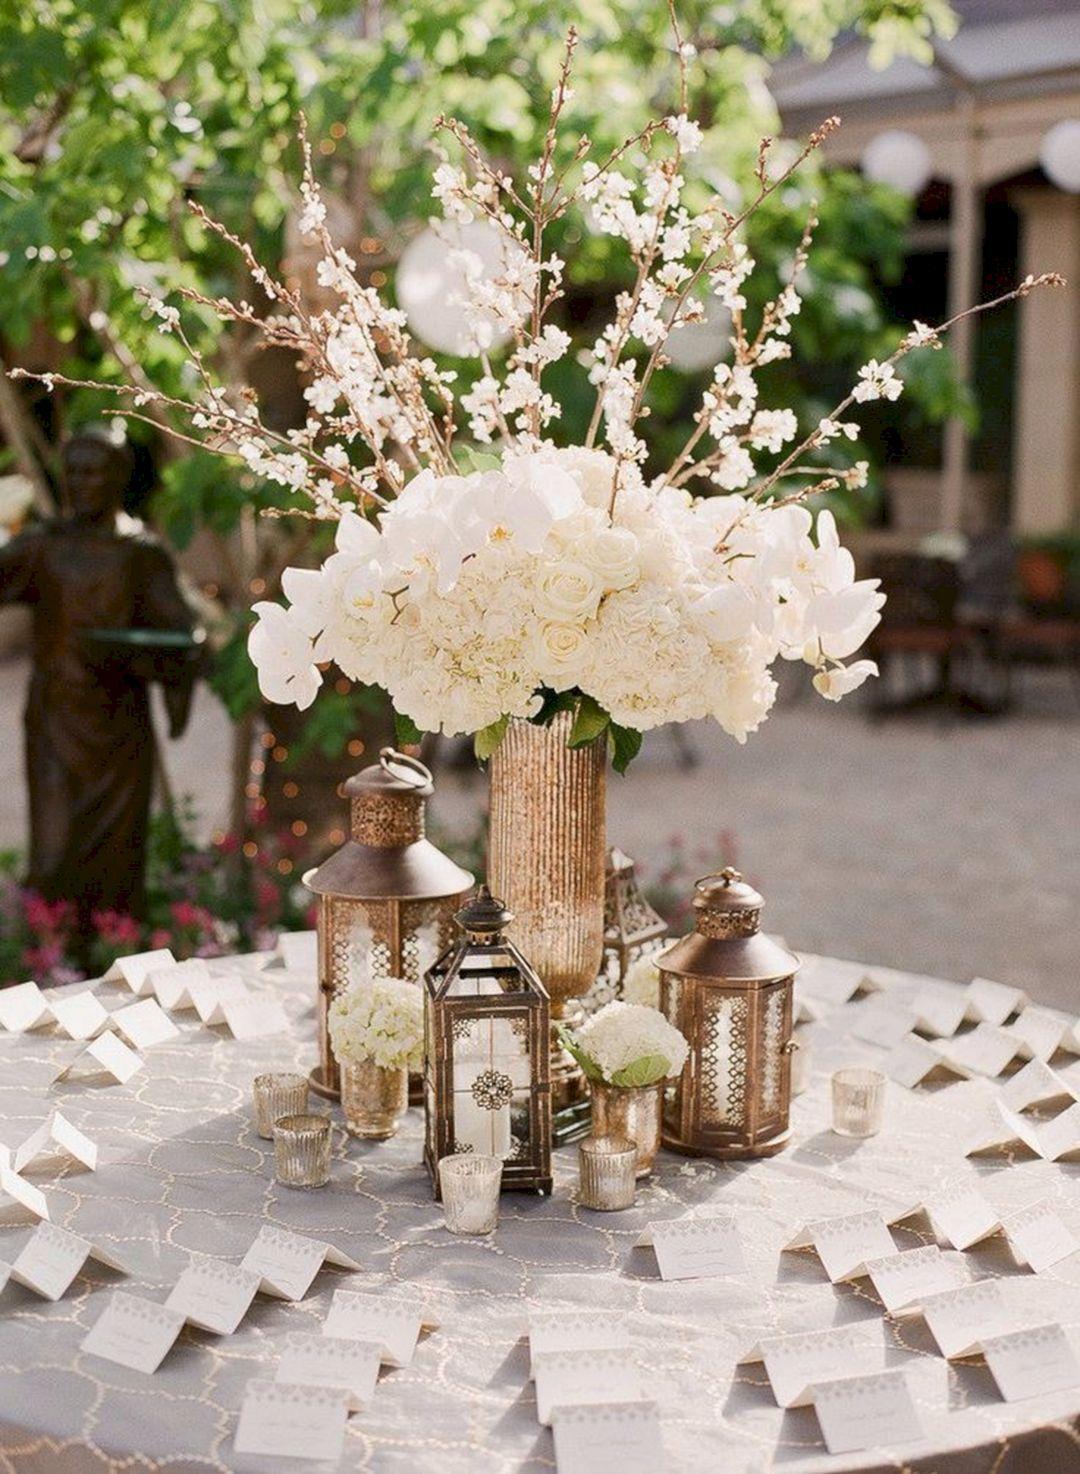 25 Wonderful Rustic Vintage Wedding Centerpieces For Awesome Wedding Decor Ideas Rustic Vintage Wedding Rustic Wedding Centerpieces Wedding Centerpieces